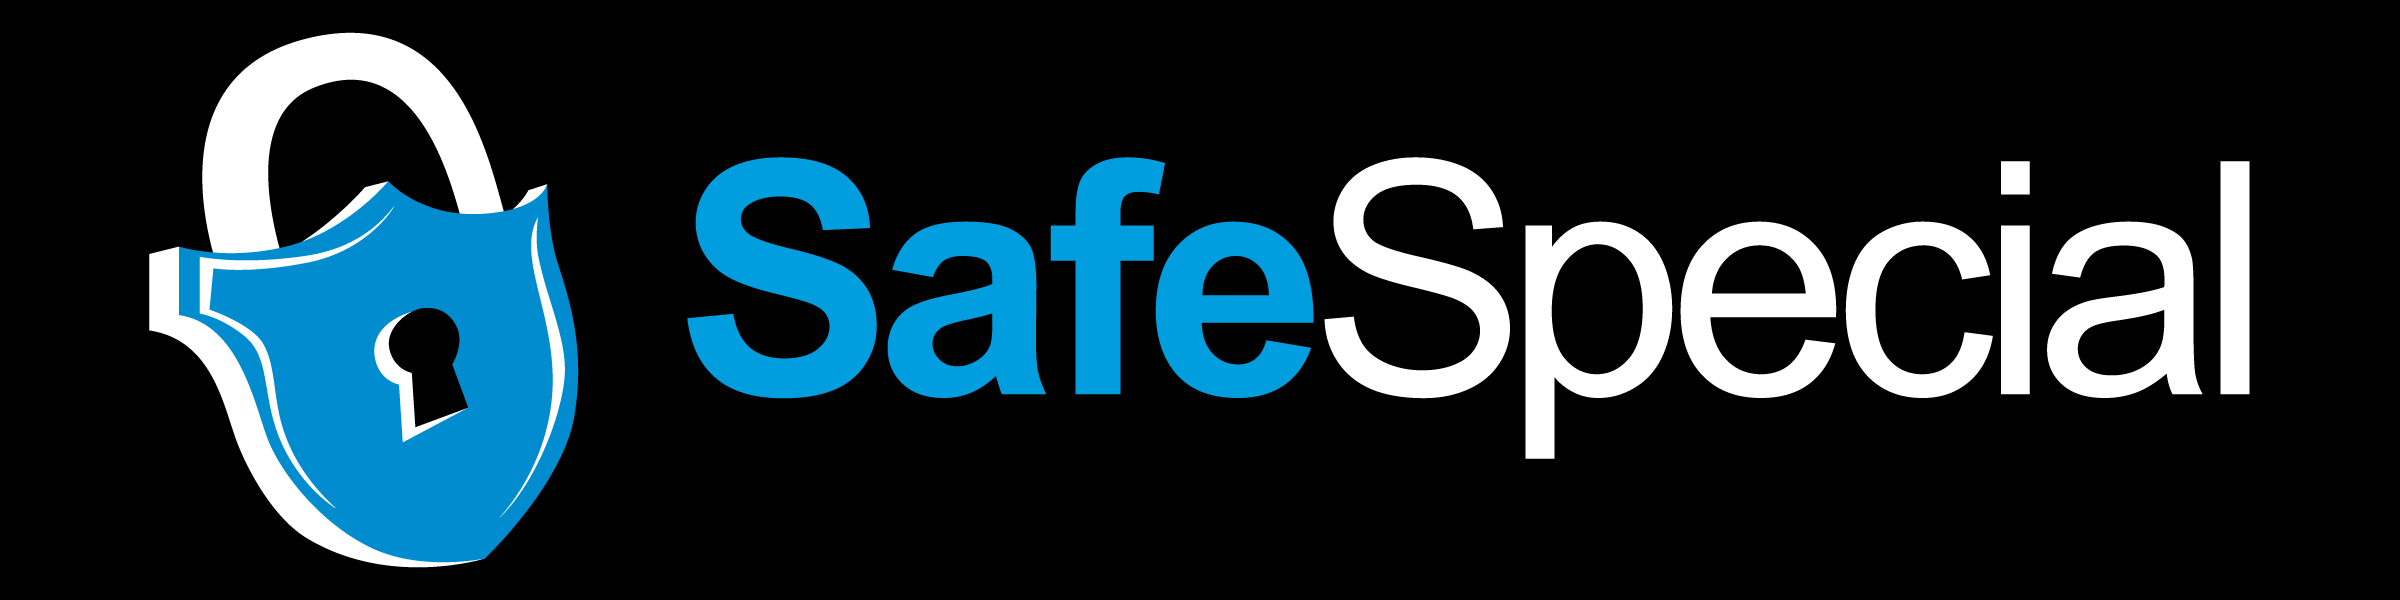 SafeSpecial LED Signs Logo